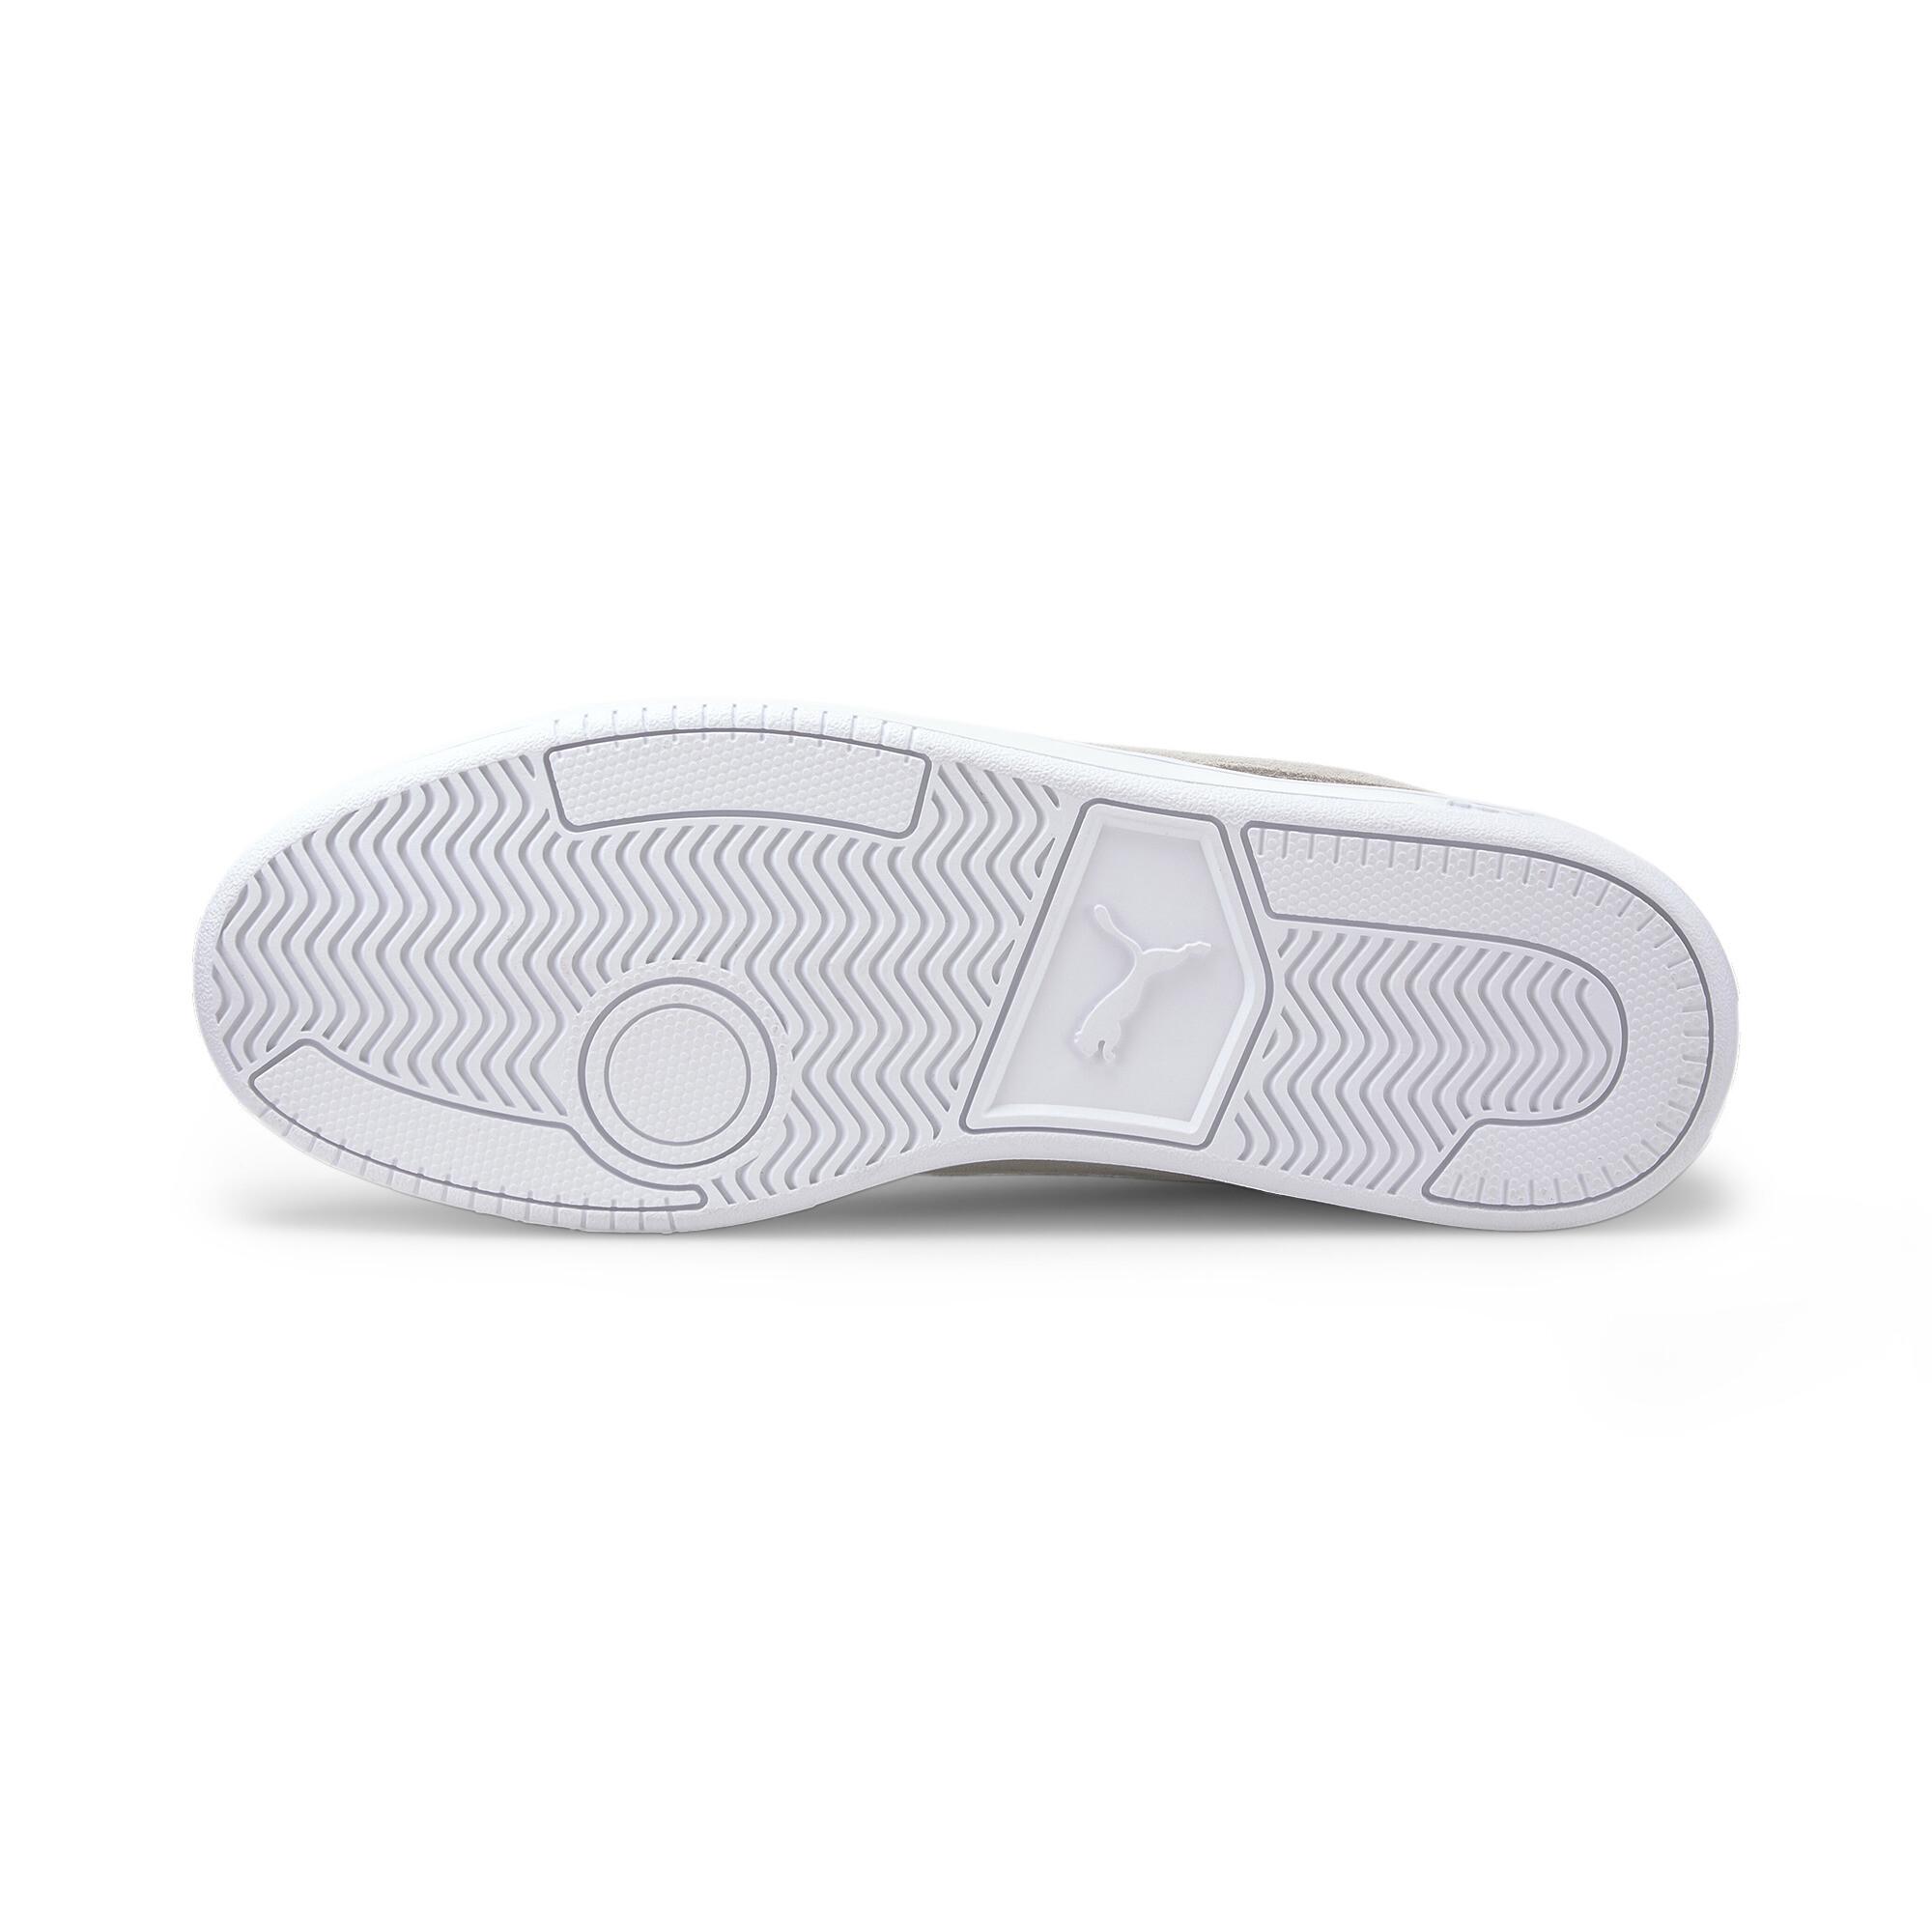 Indexbild 5 - PUMA Court Legend Lo Sneaker Unisex Schuhe Basics Neu